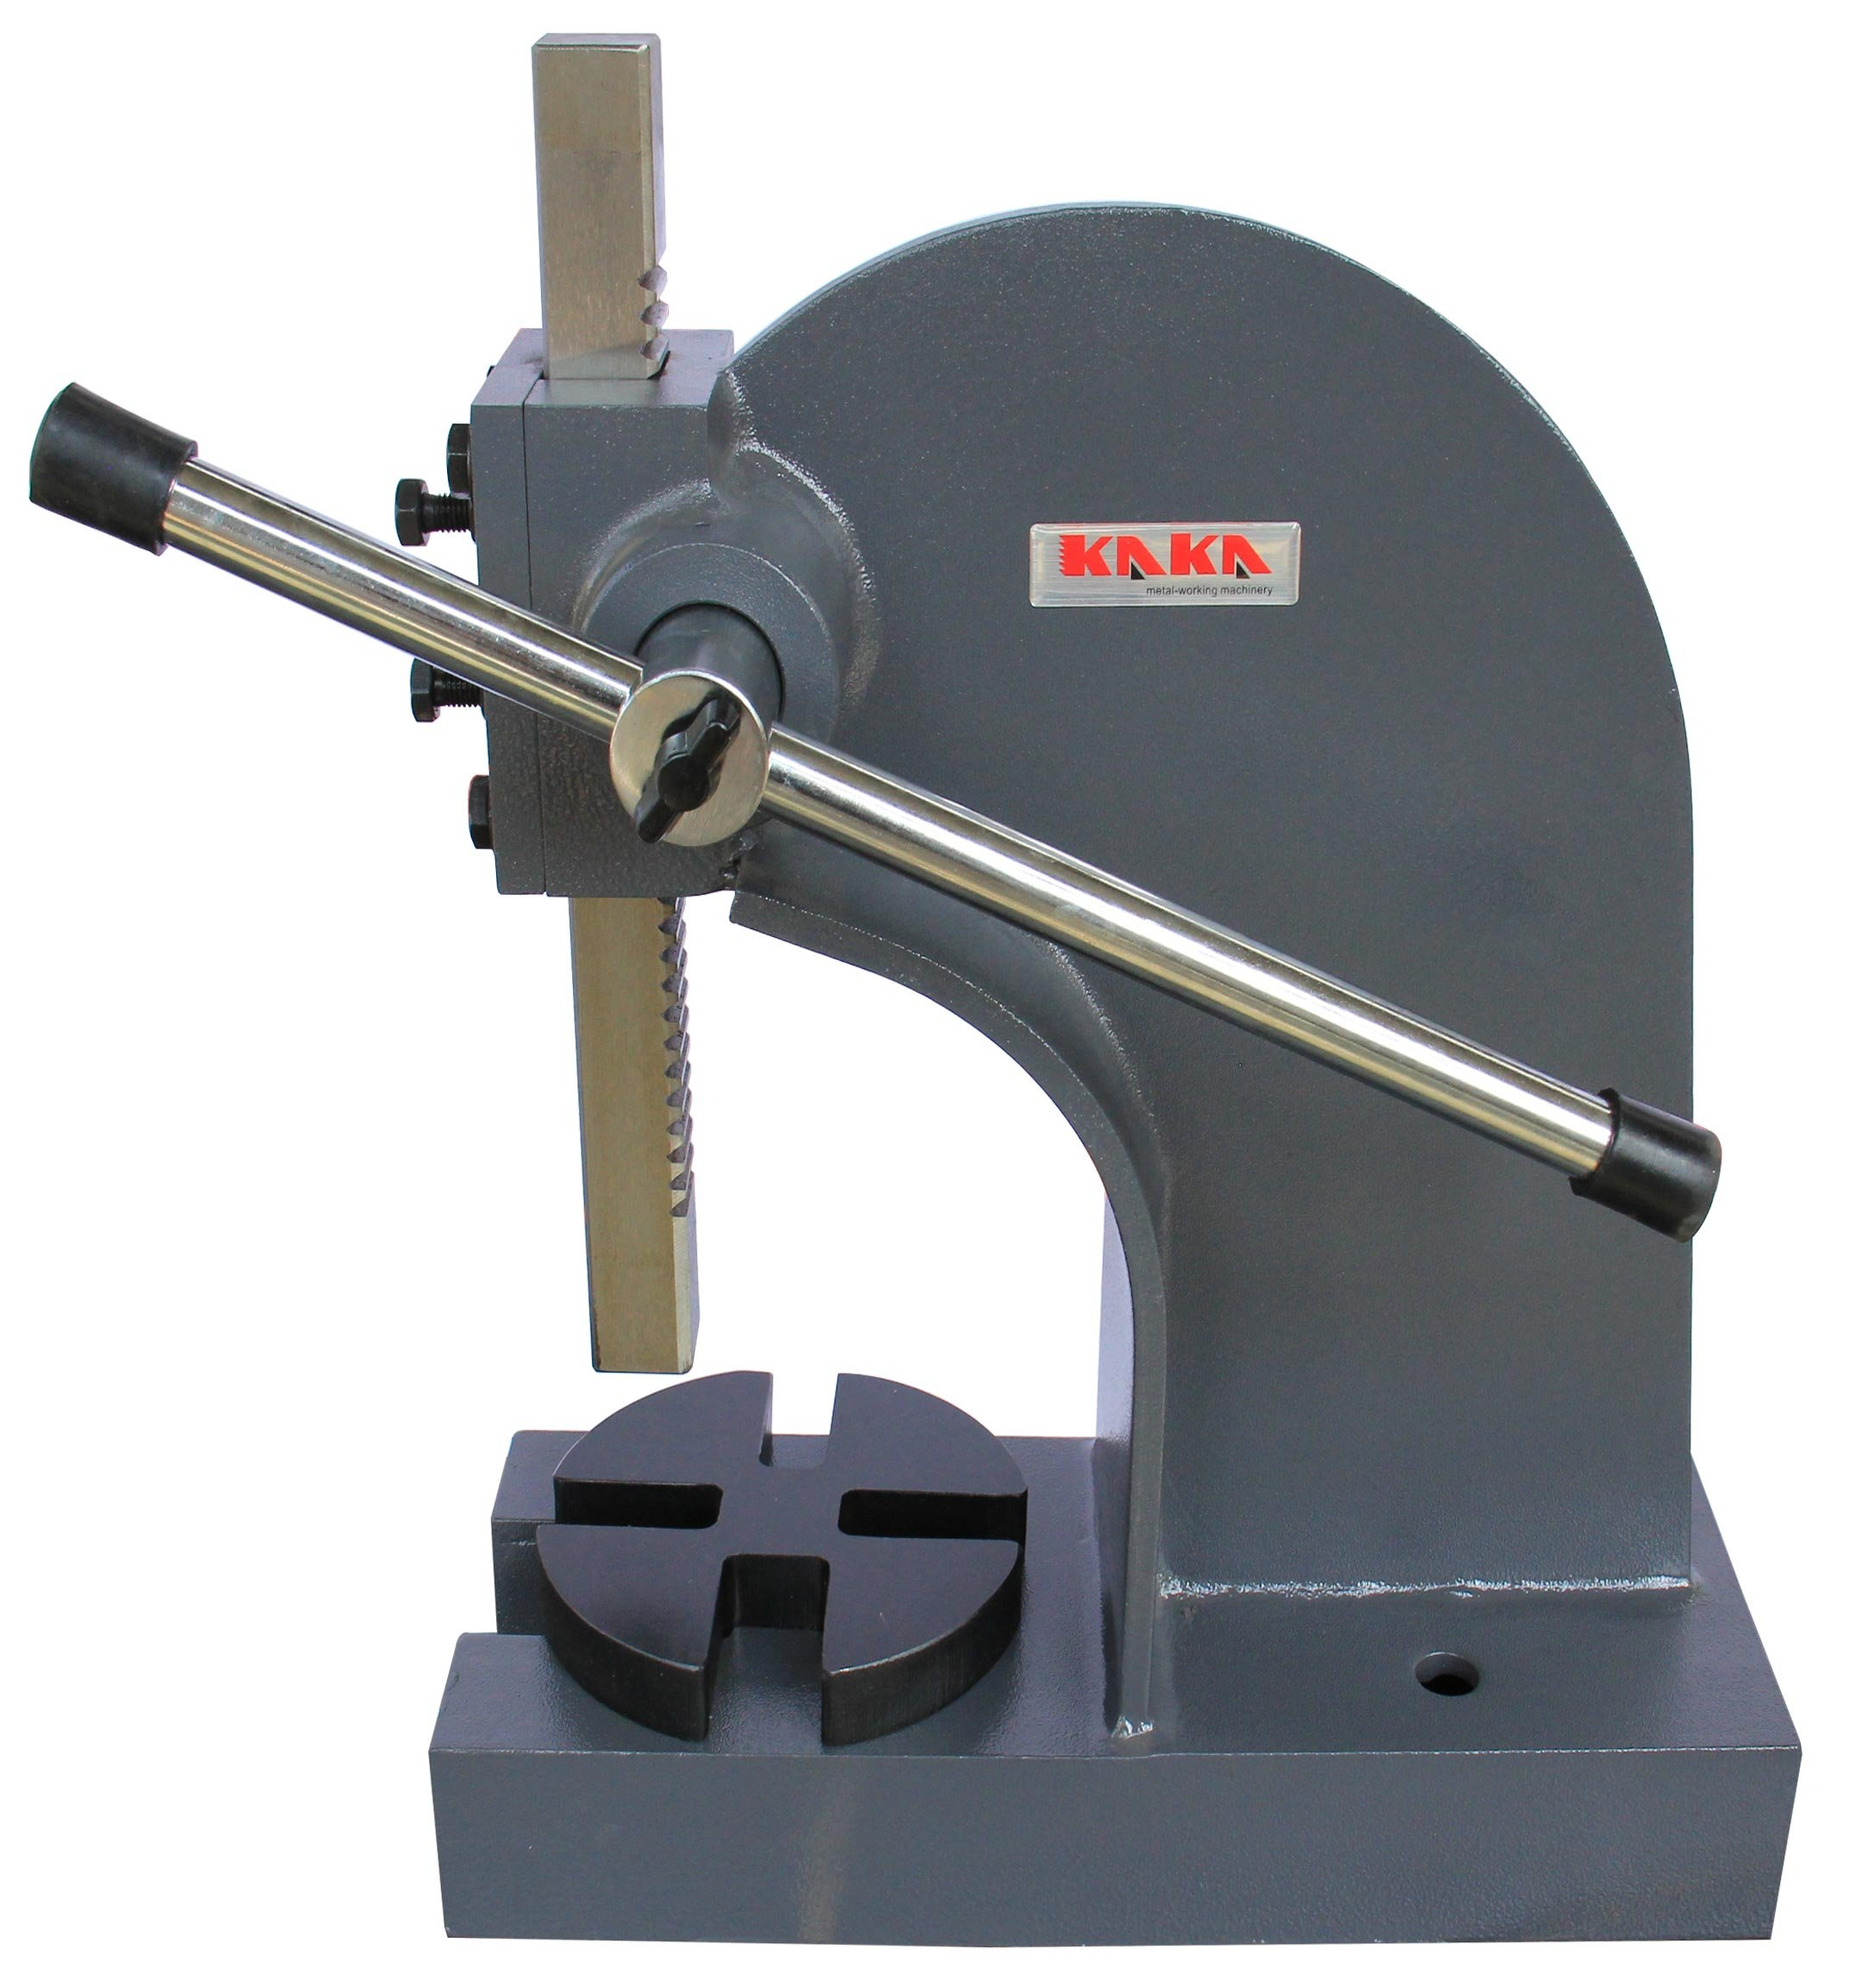 KAKA Industrial AP-2 Arbor Press, 2 Ton Cast Iron Arbor Press, 7'' Height Heavy Duty Arbor Press